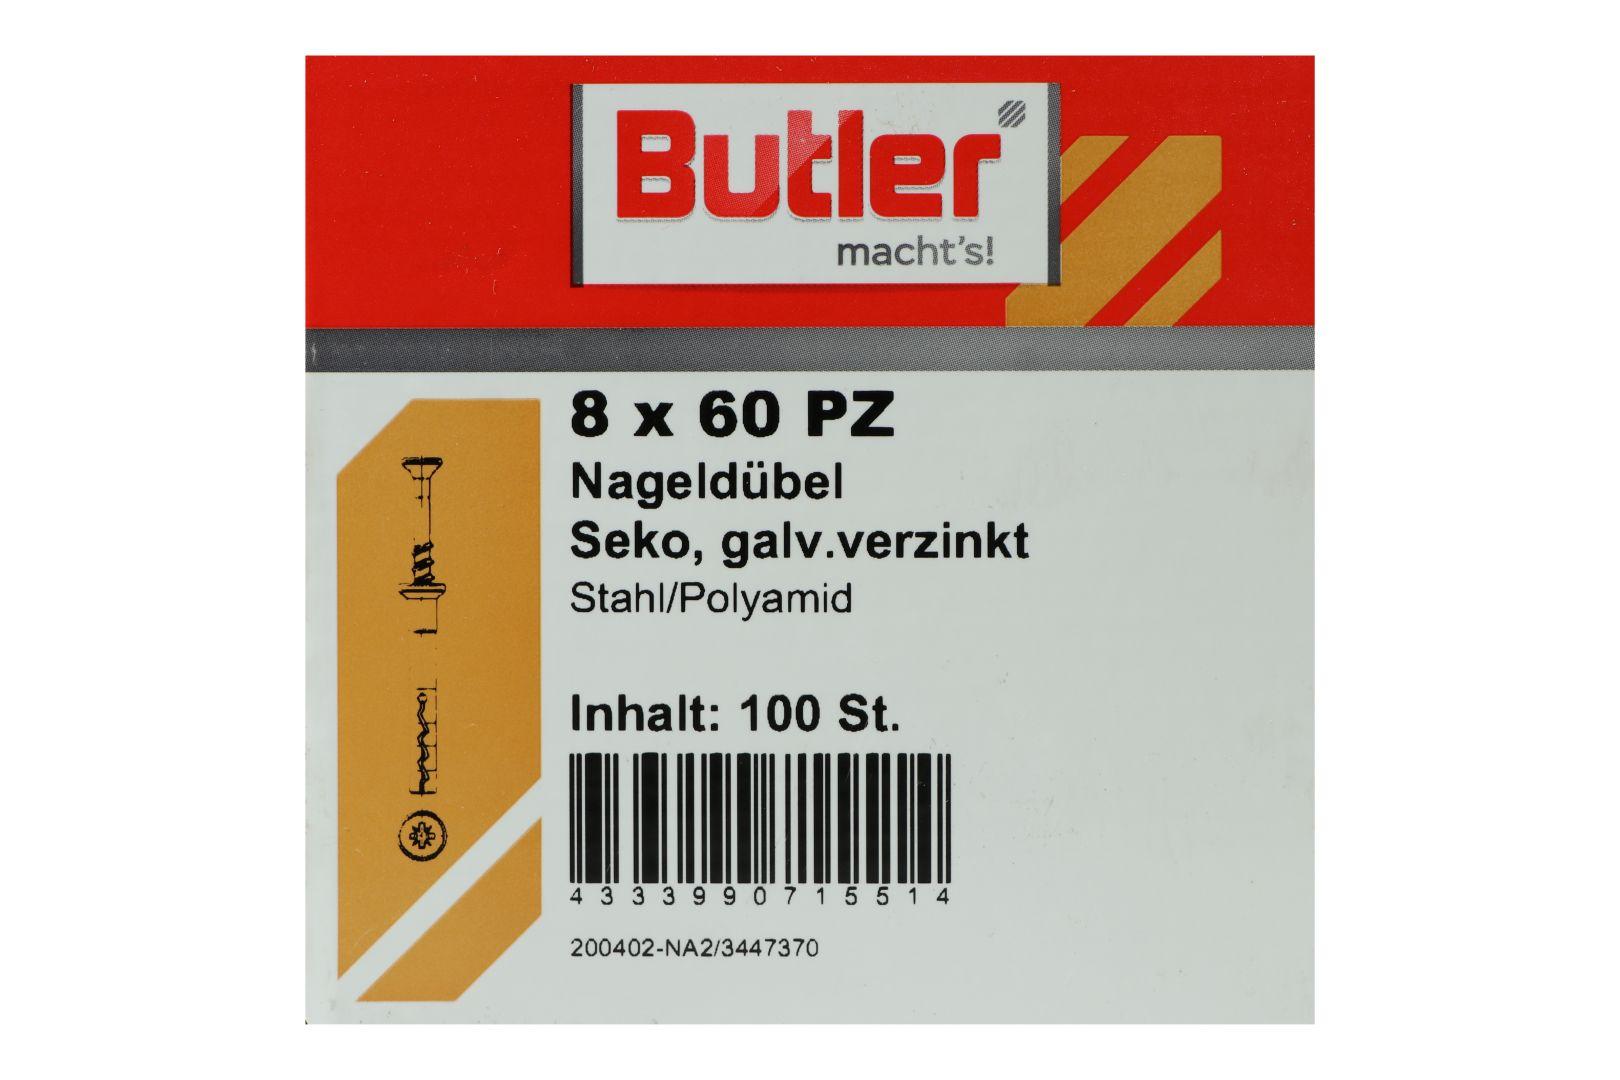 Butler macht's! Nageldübel, Stahl / Polyamid, Senkkopf, galvanisch verzinkt 8 x 60 mm, 100 Stück